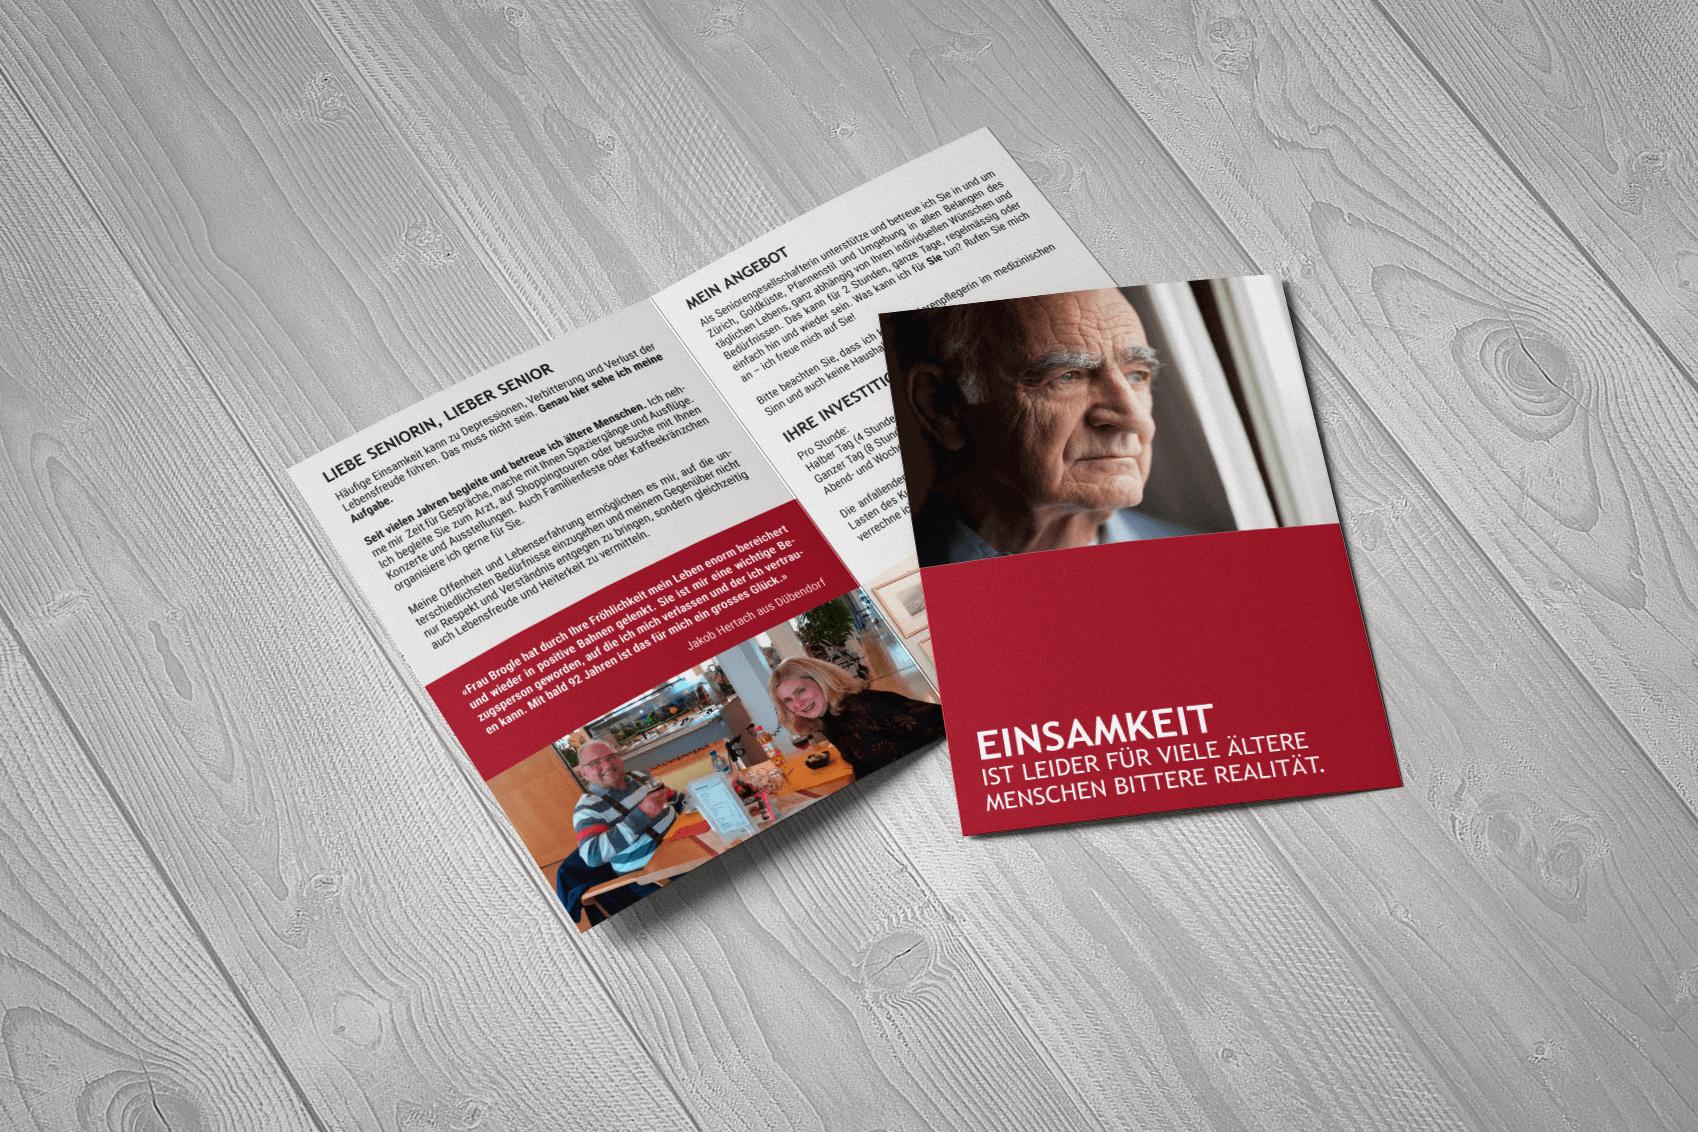 Werbeagentur Diener Design: Seniorenfee